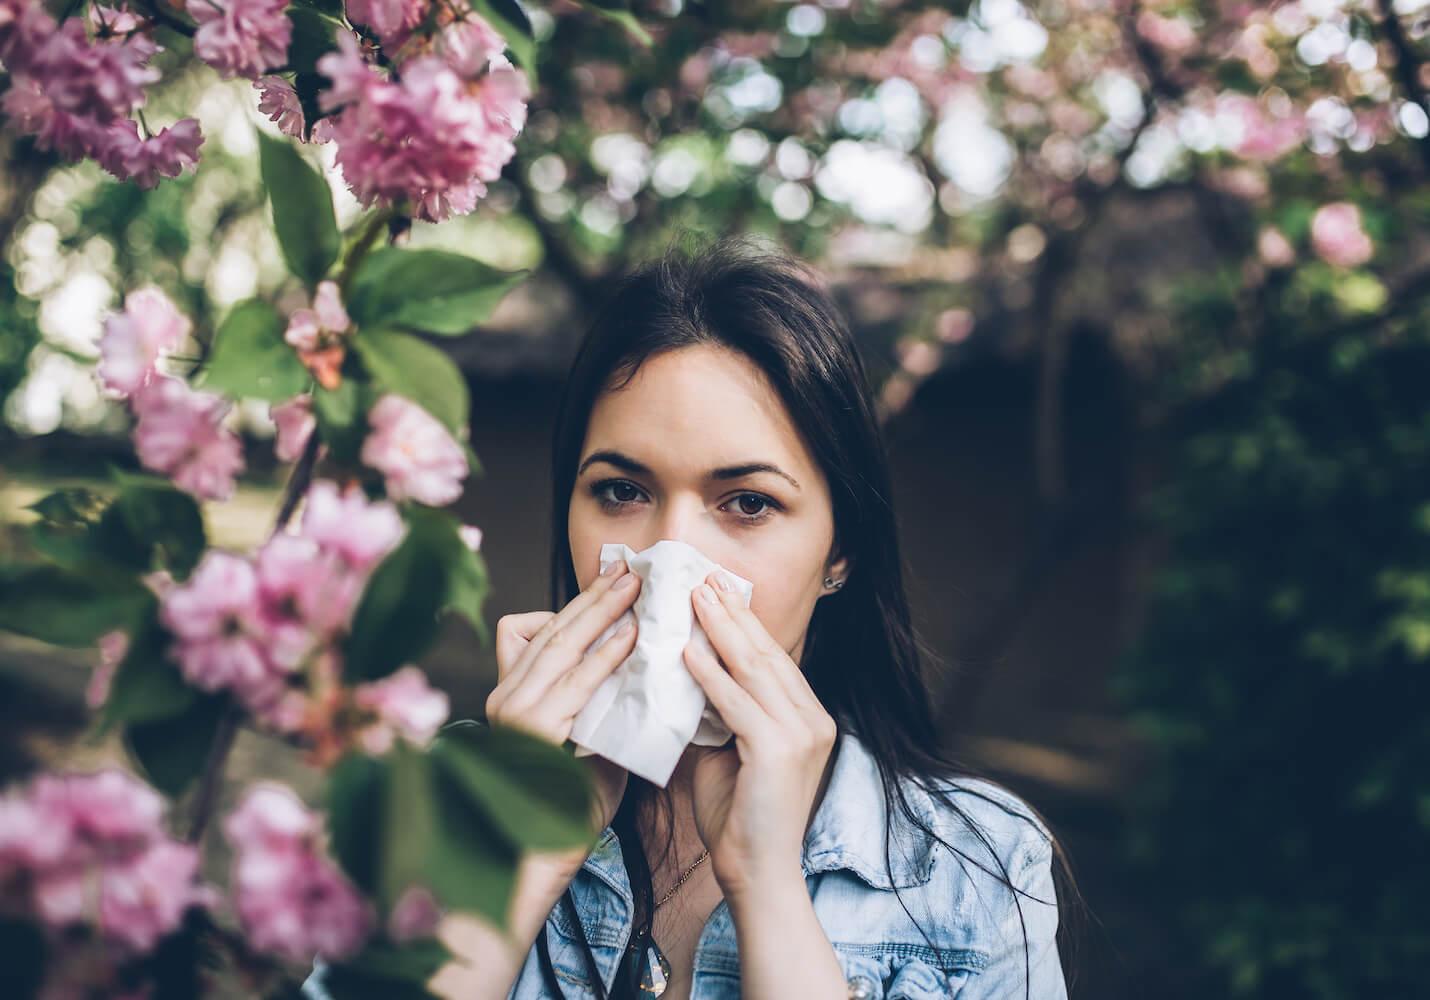 Woman using a facial tissue